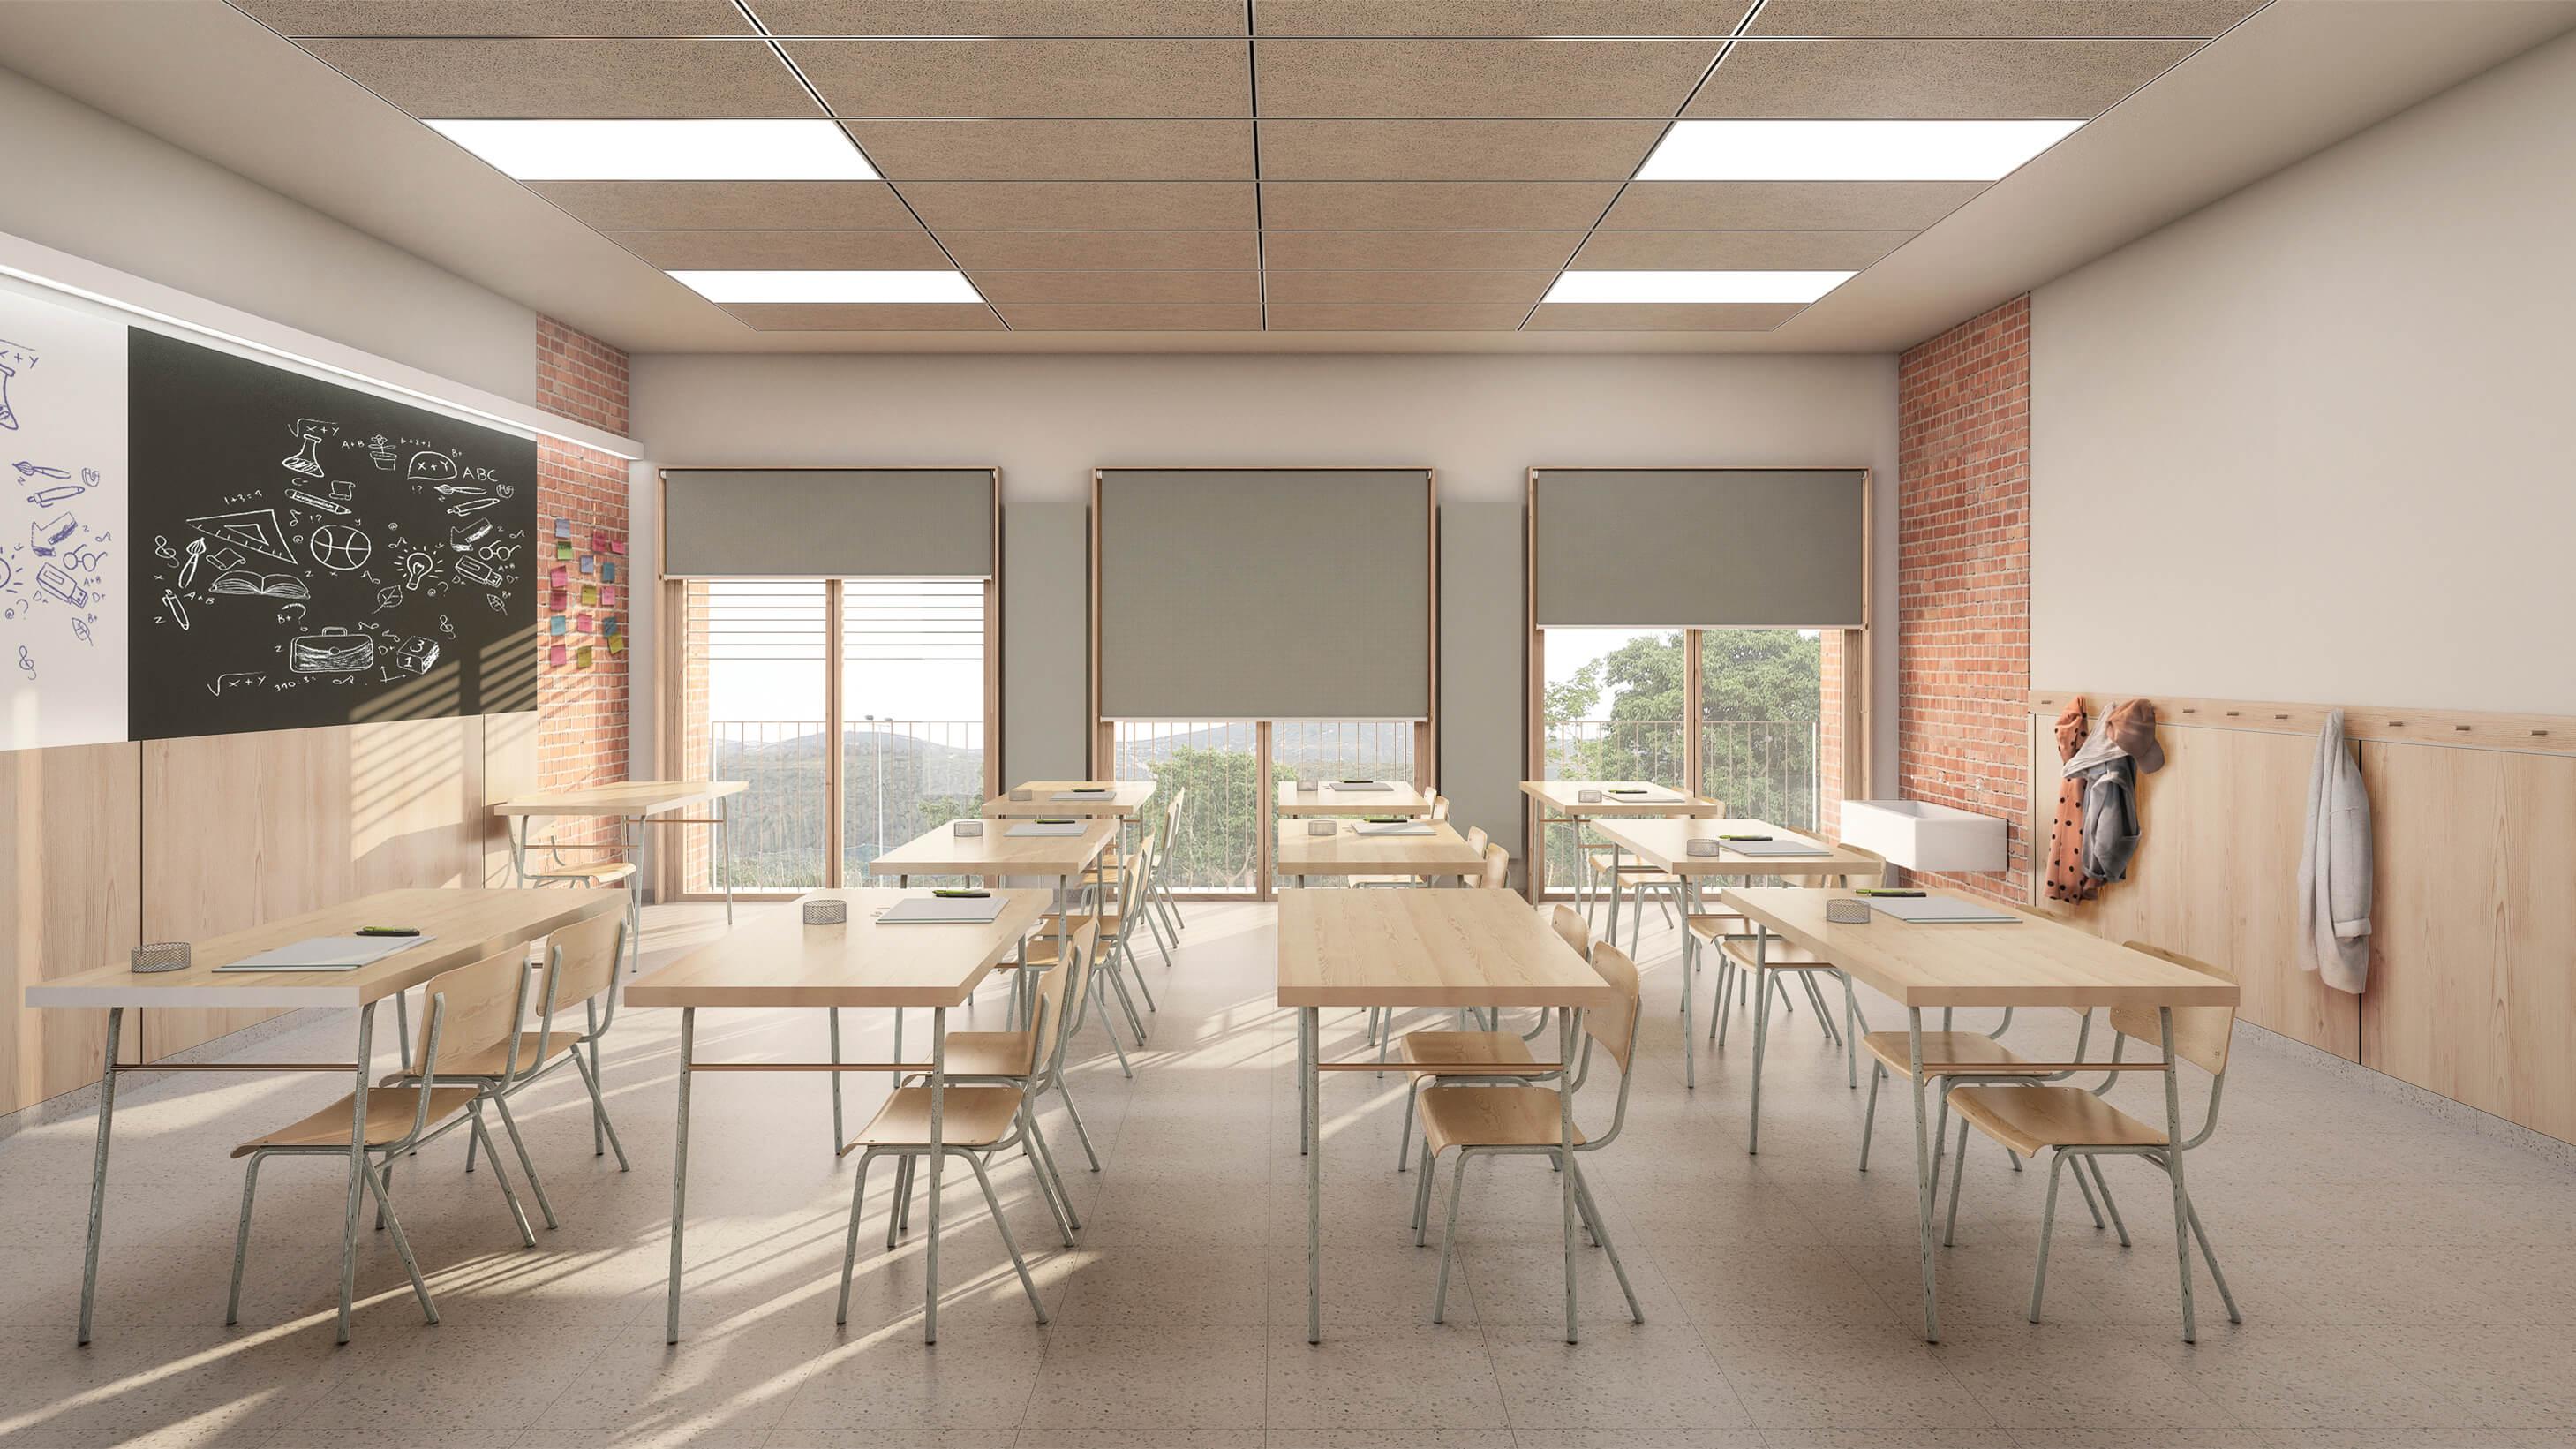 31-Escola Montmell - FPA arquitectes